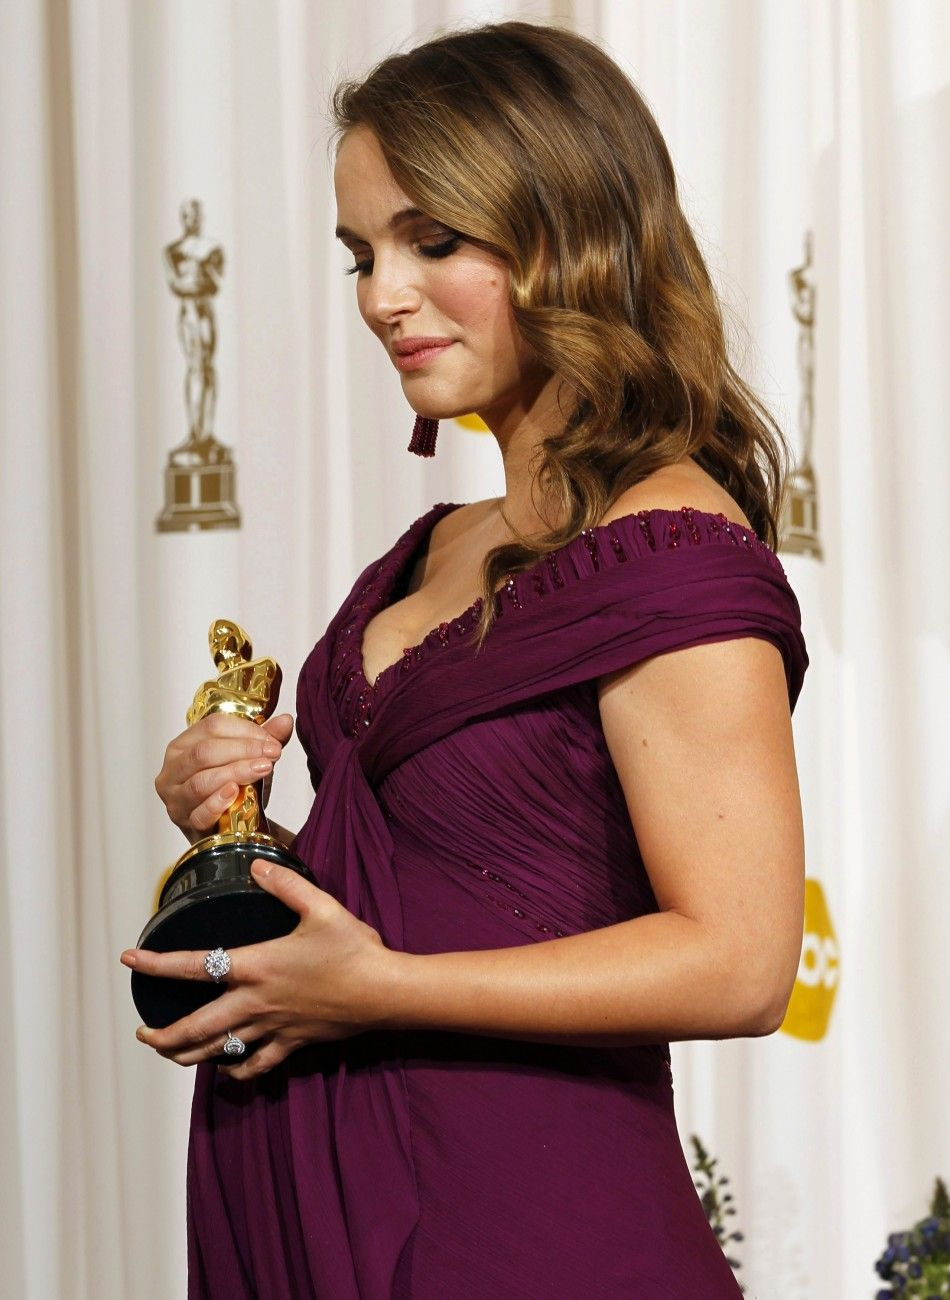 natalie portman pregnant again | Natalie Portman ...